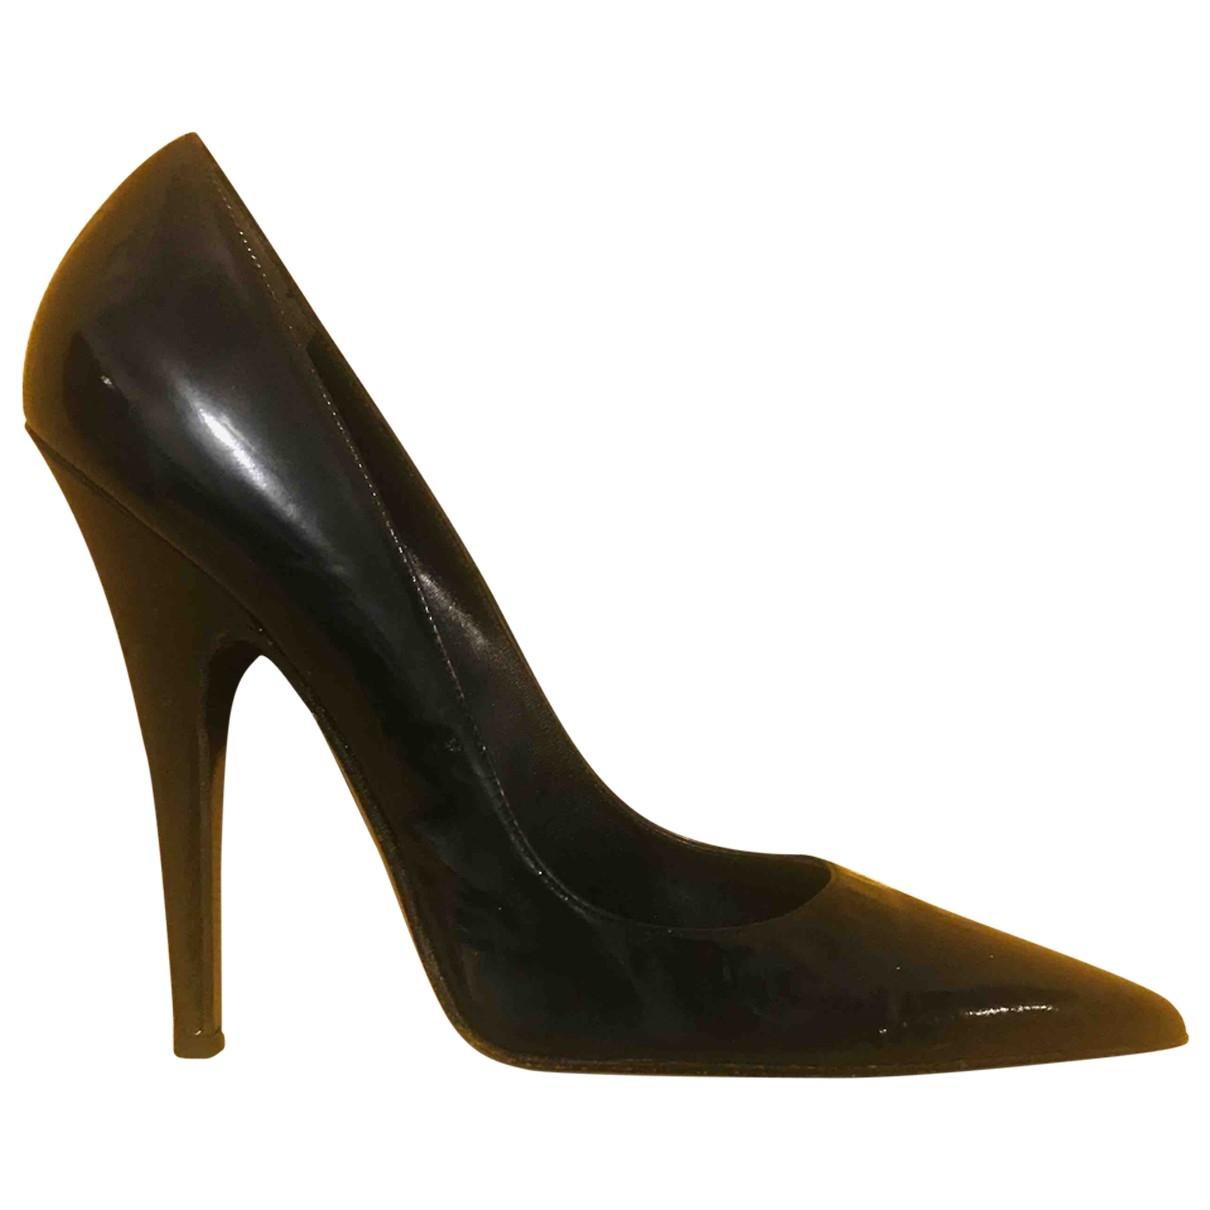 Anna Molinari \N Black Patent leather Heels for Women 40 EU